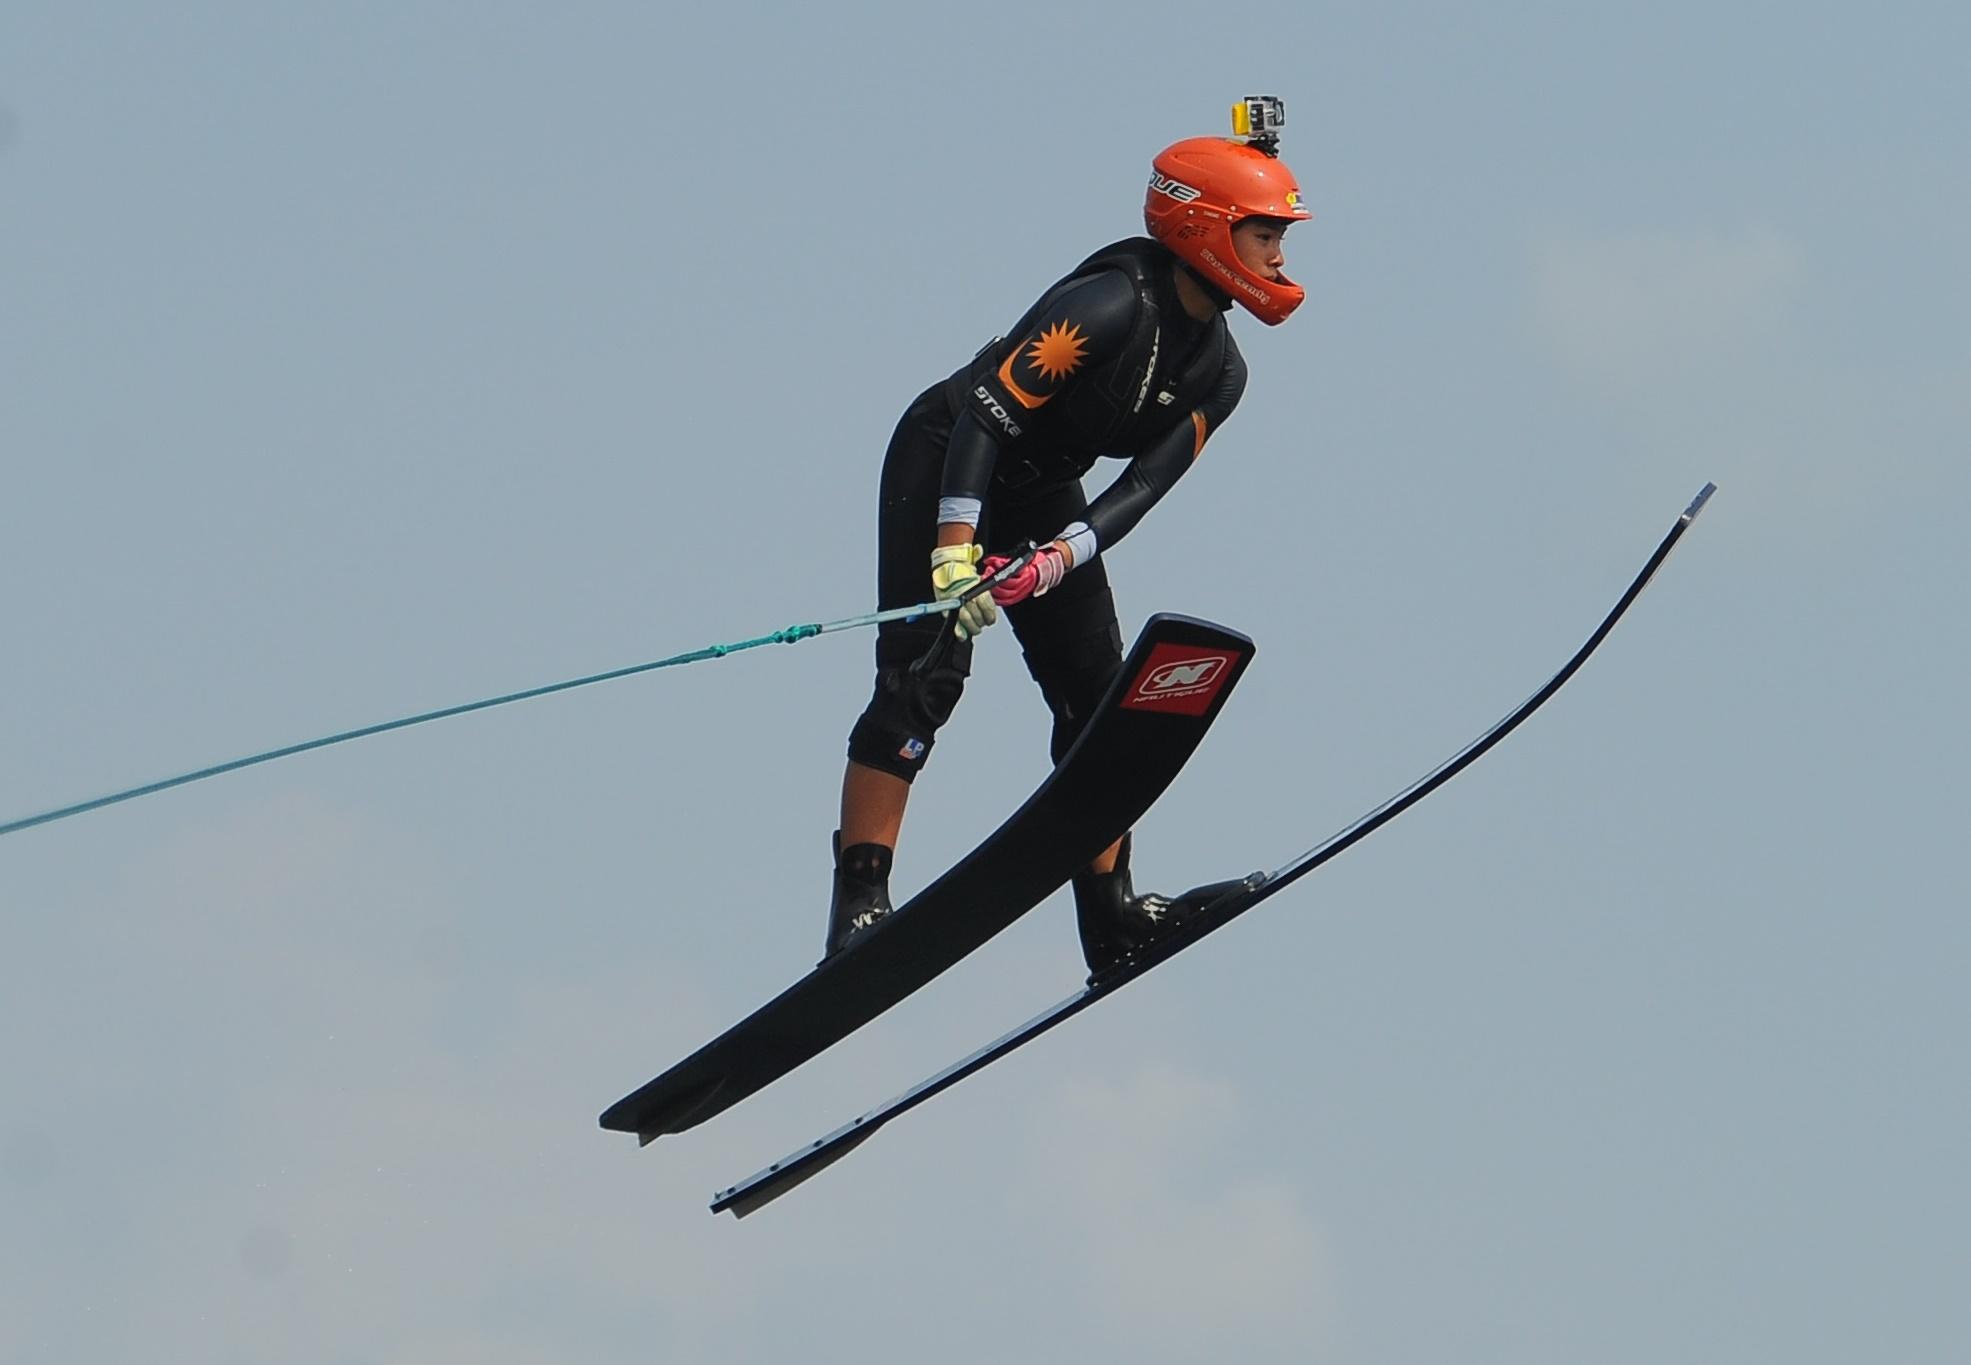 Aaliyah_2019-02-17_aaliyah jumping in Putrajaya_wanahfong_ARP_0821_cropped2